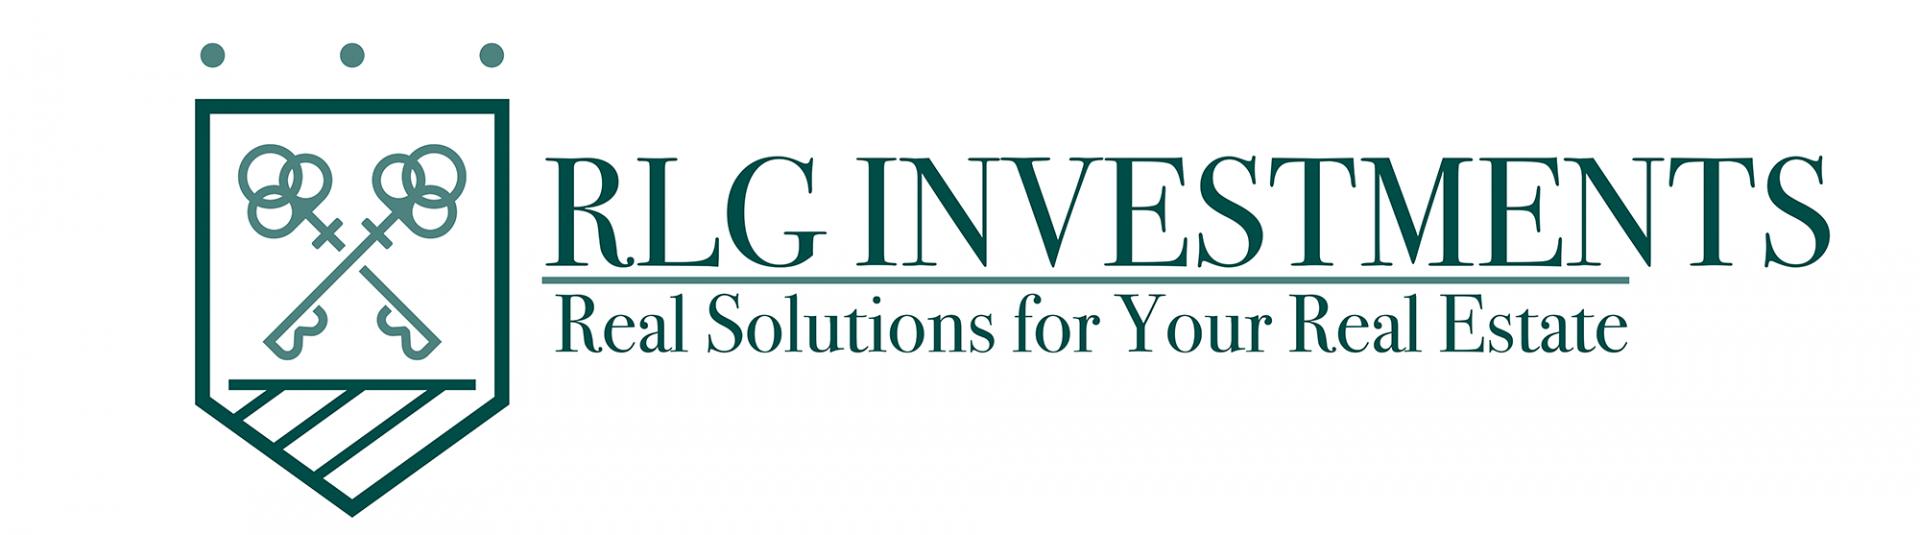 RLG Investments  logo